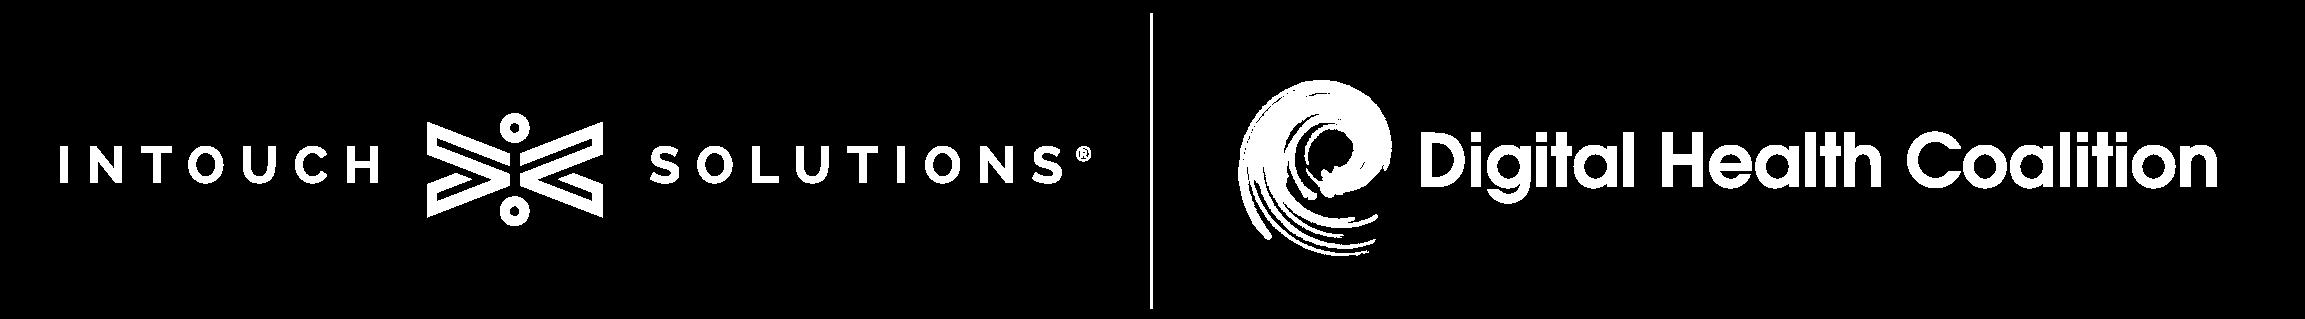 Intouch Solutions Logo & Digital Health Coalition Logo